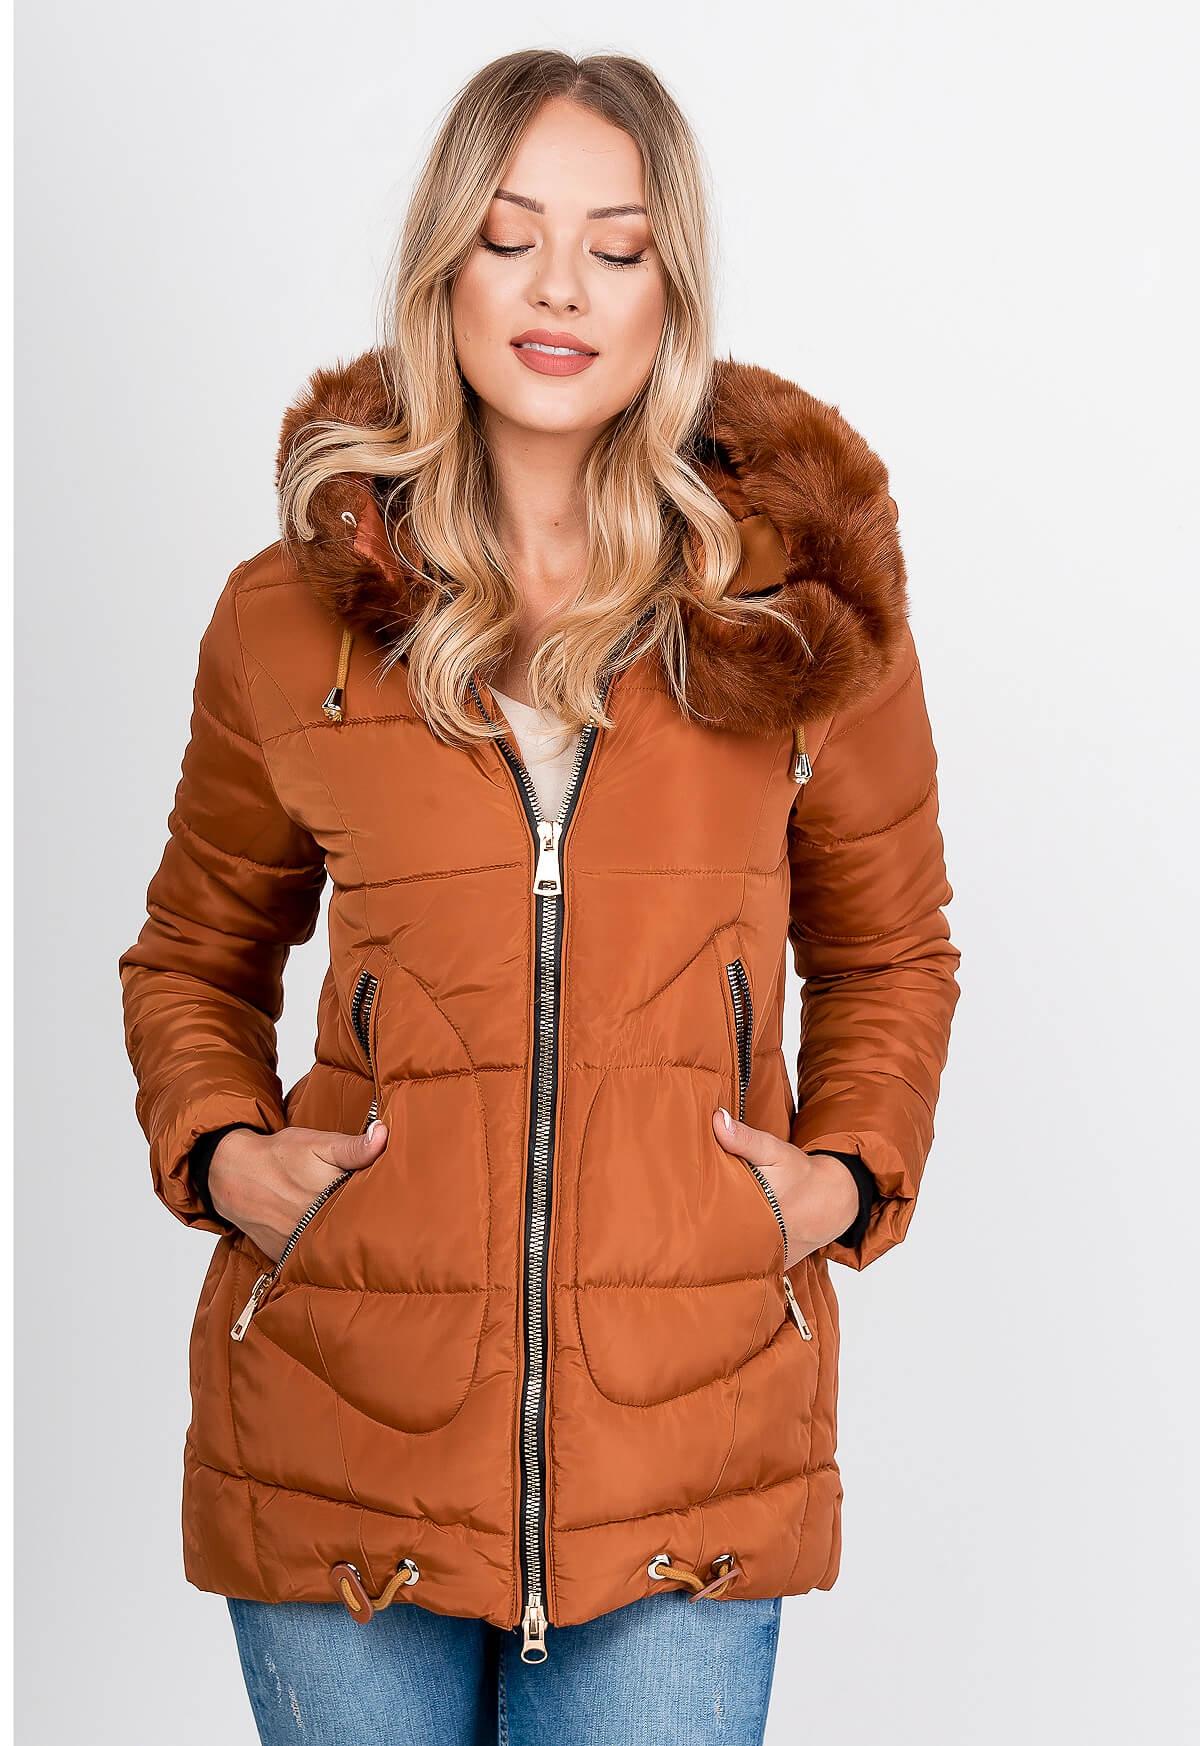 Dámska hnedá zimná bunda s kapucňou